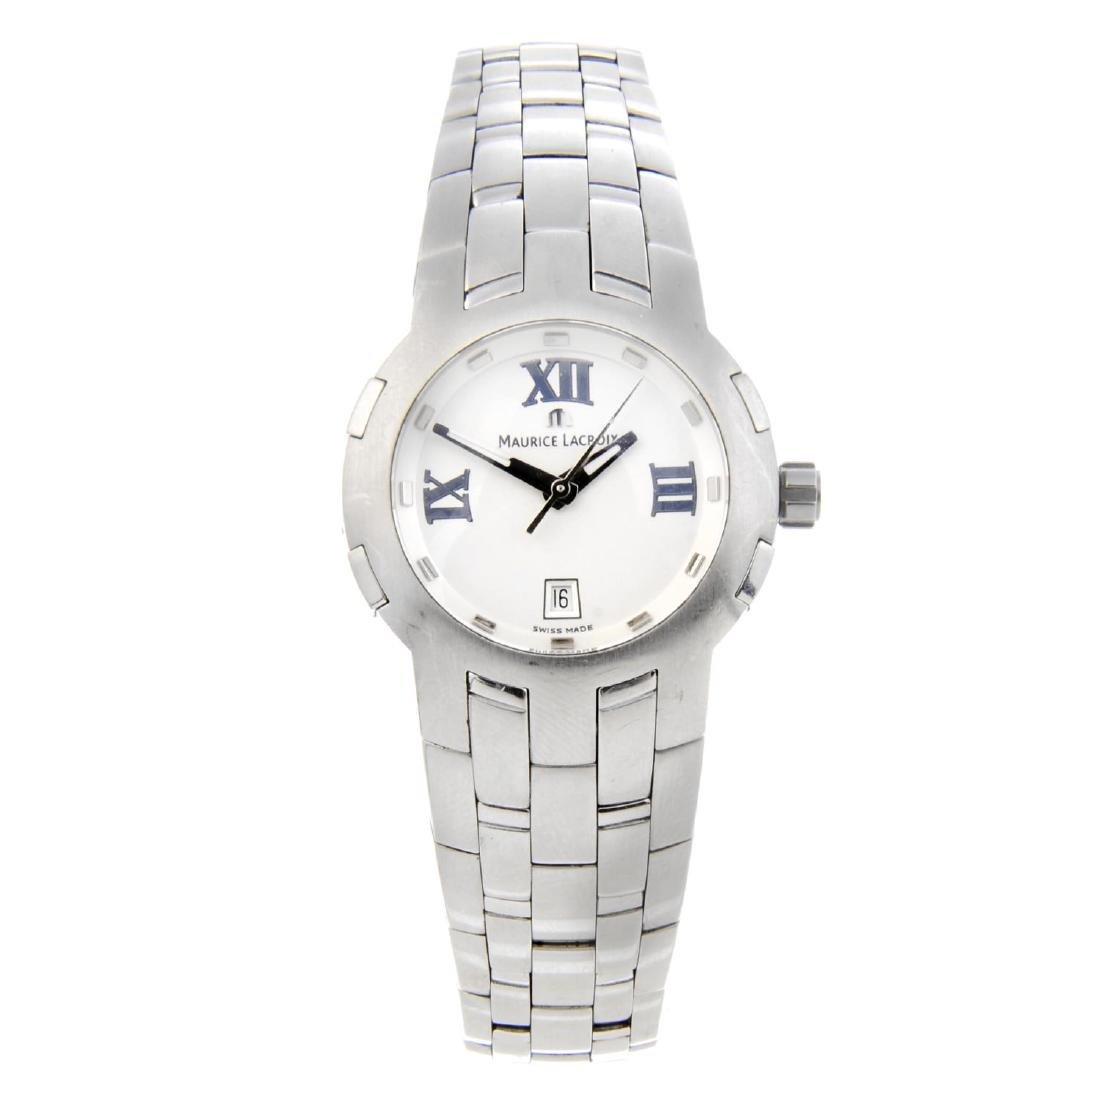 MAURICE LACROIX - a lady's Milestone bracelet watch.